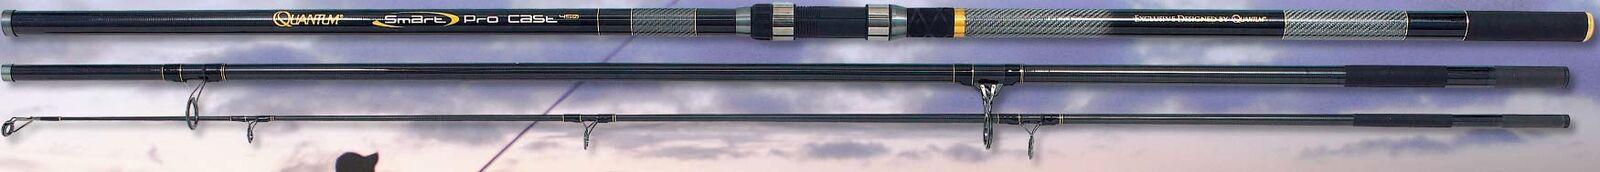 QUANTUM Smart PRO CAST 420 14FT Beachcaster Pesca Rod 3 pezzi